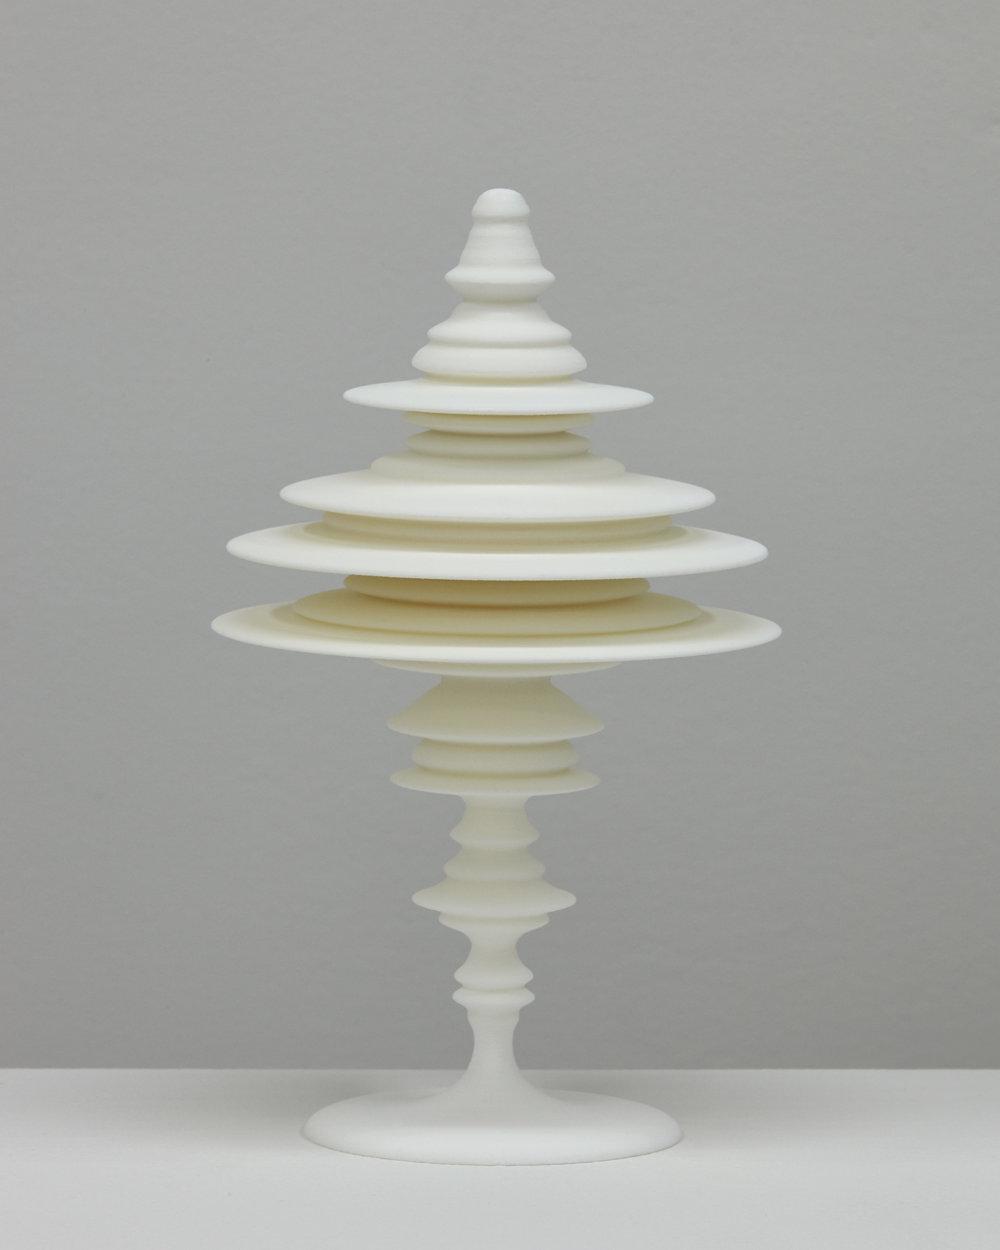 "Laura Splan, ""Manifest (Swallow),"" 2015, Laser sintered polyamide nylon, 8 x 4.75 x 4.75 inches, edition of 5 plus one artist proof"